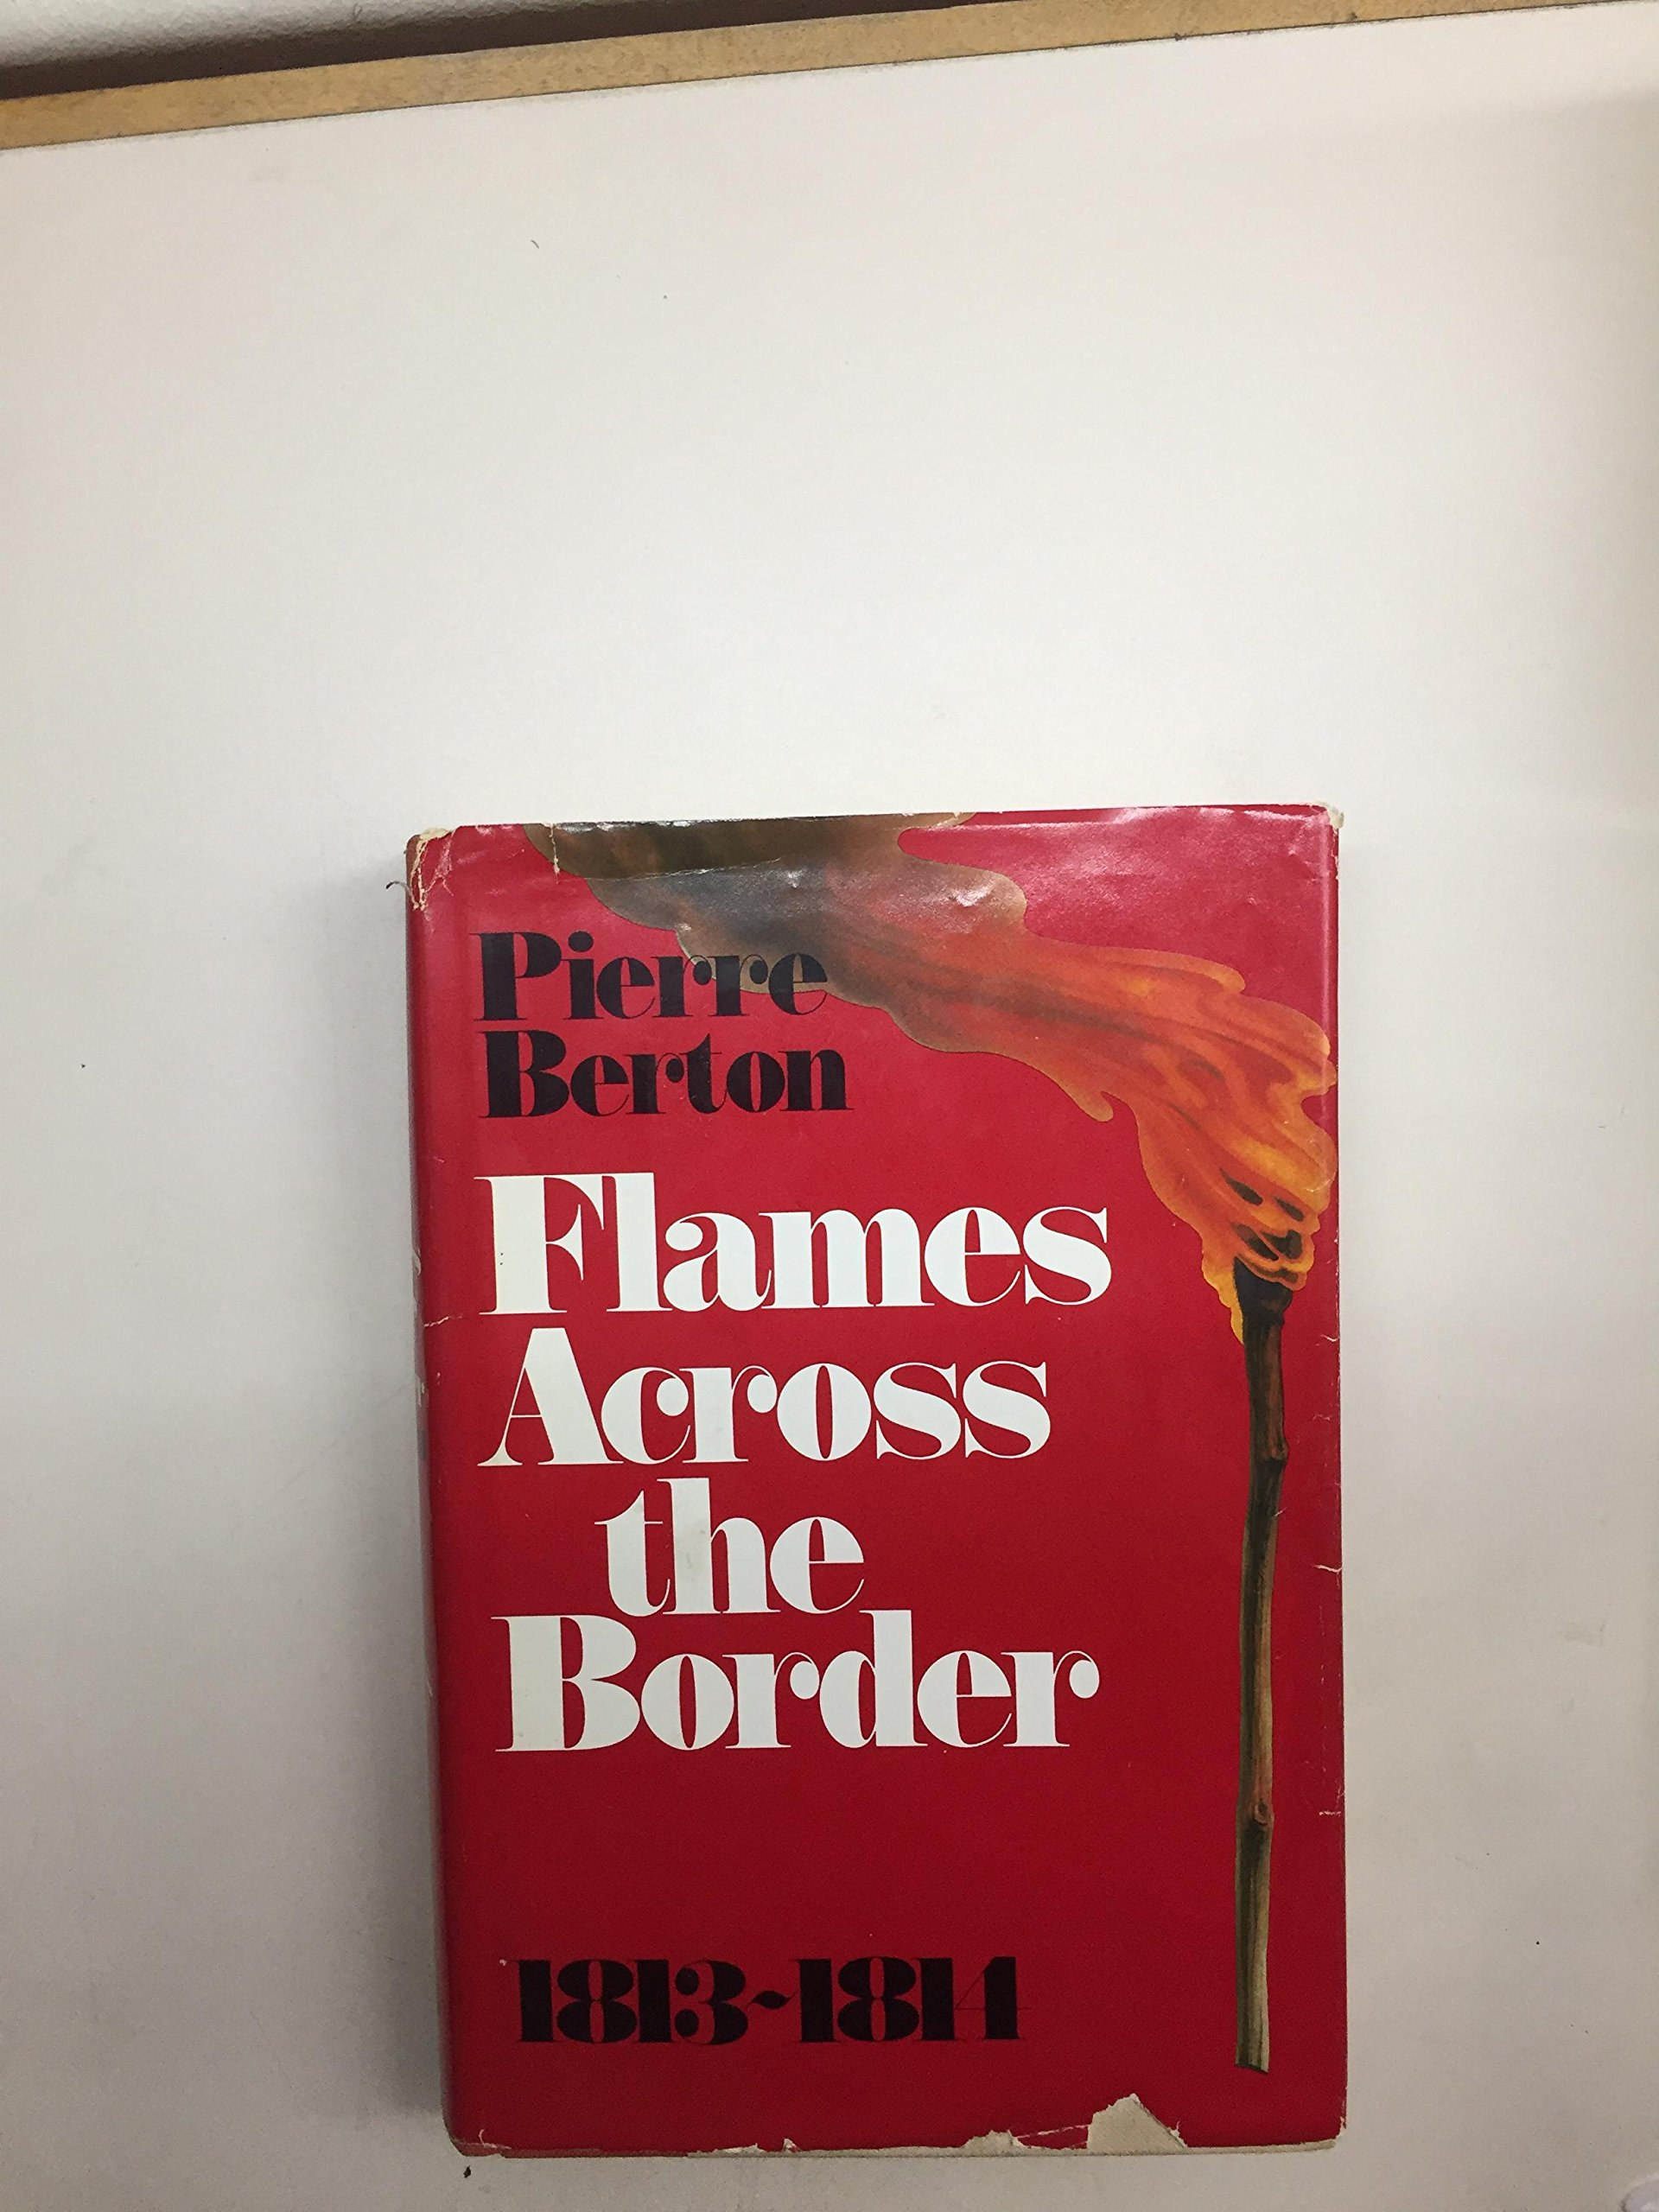 Flames Across the Border: Pierre Berton: 9780771012440: Books - Amazon.ca